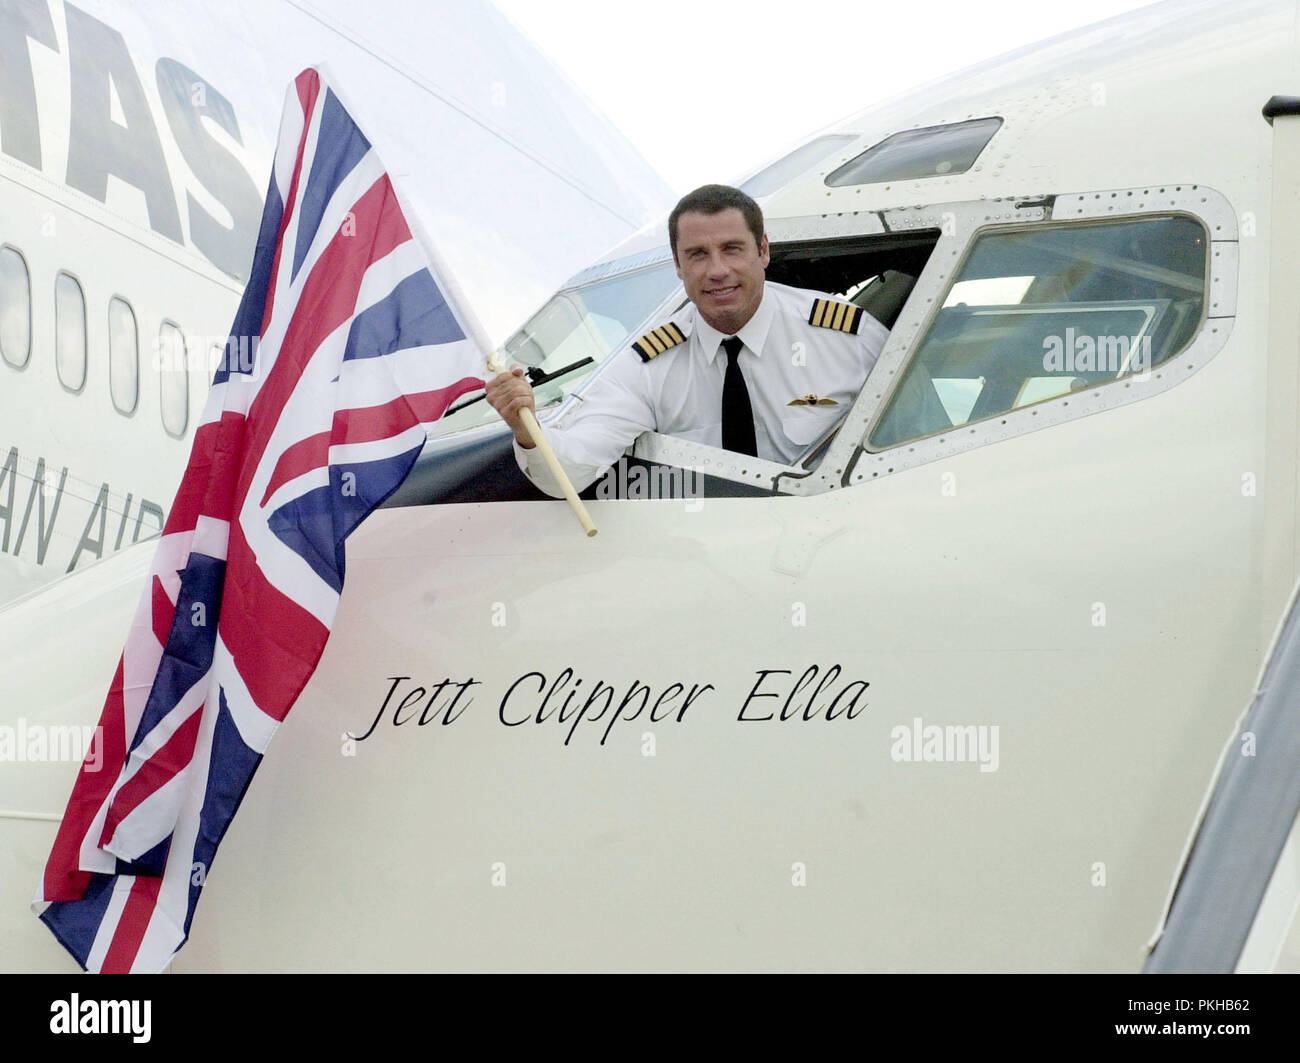 d8b863406418 ... Qantas Ambassador at large arrives in London as part of his